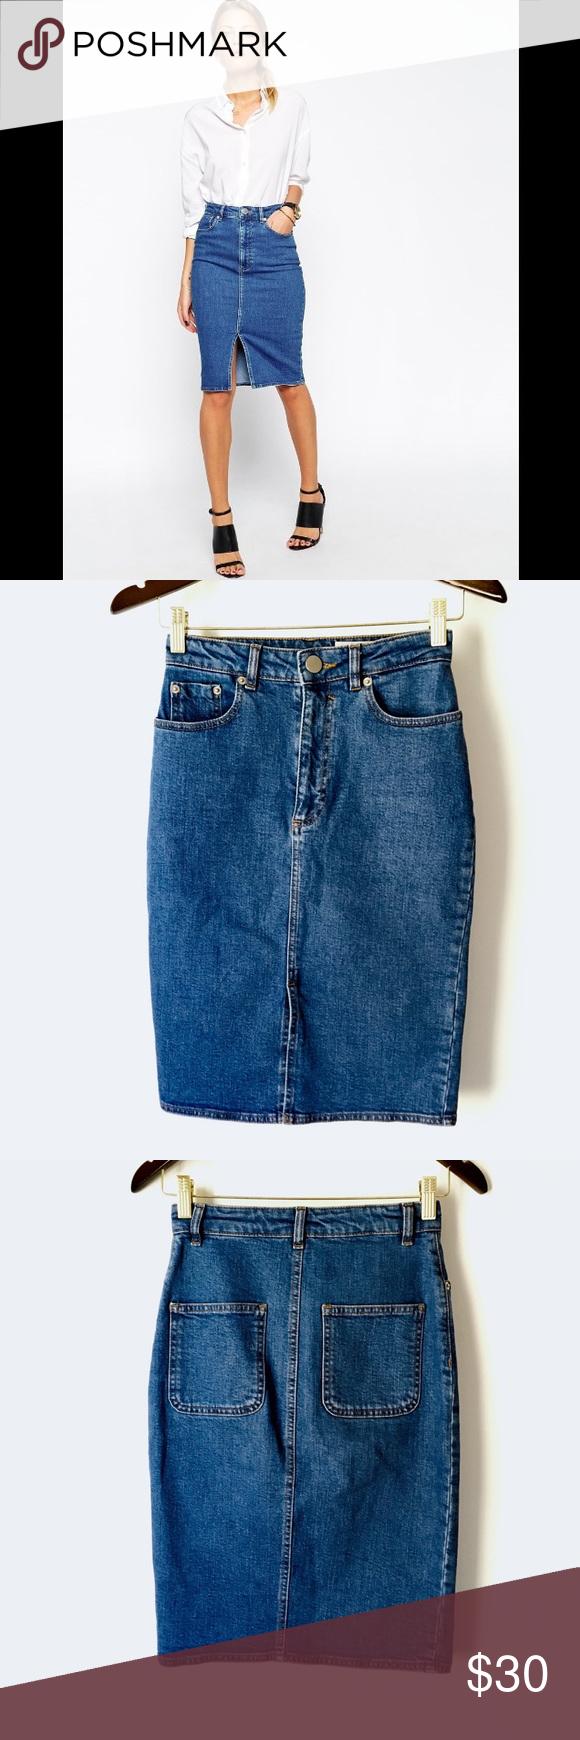 8052e80eea4 ASOS High Waist Split Front Denim Skirt Trendy pencil skirt from ASOS in  sturdy mid wash